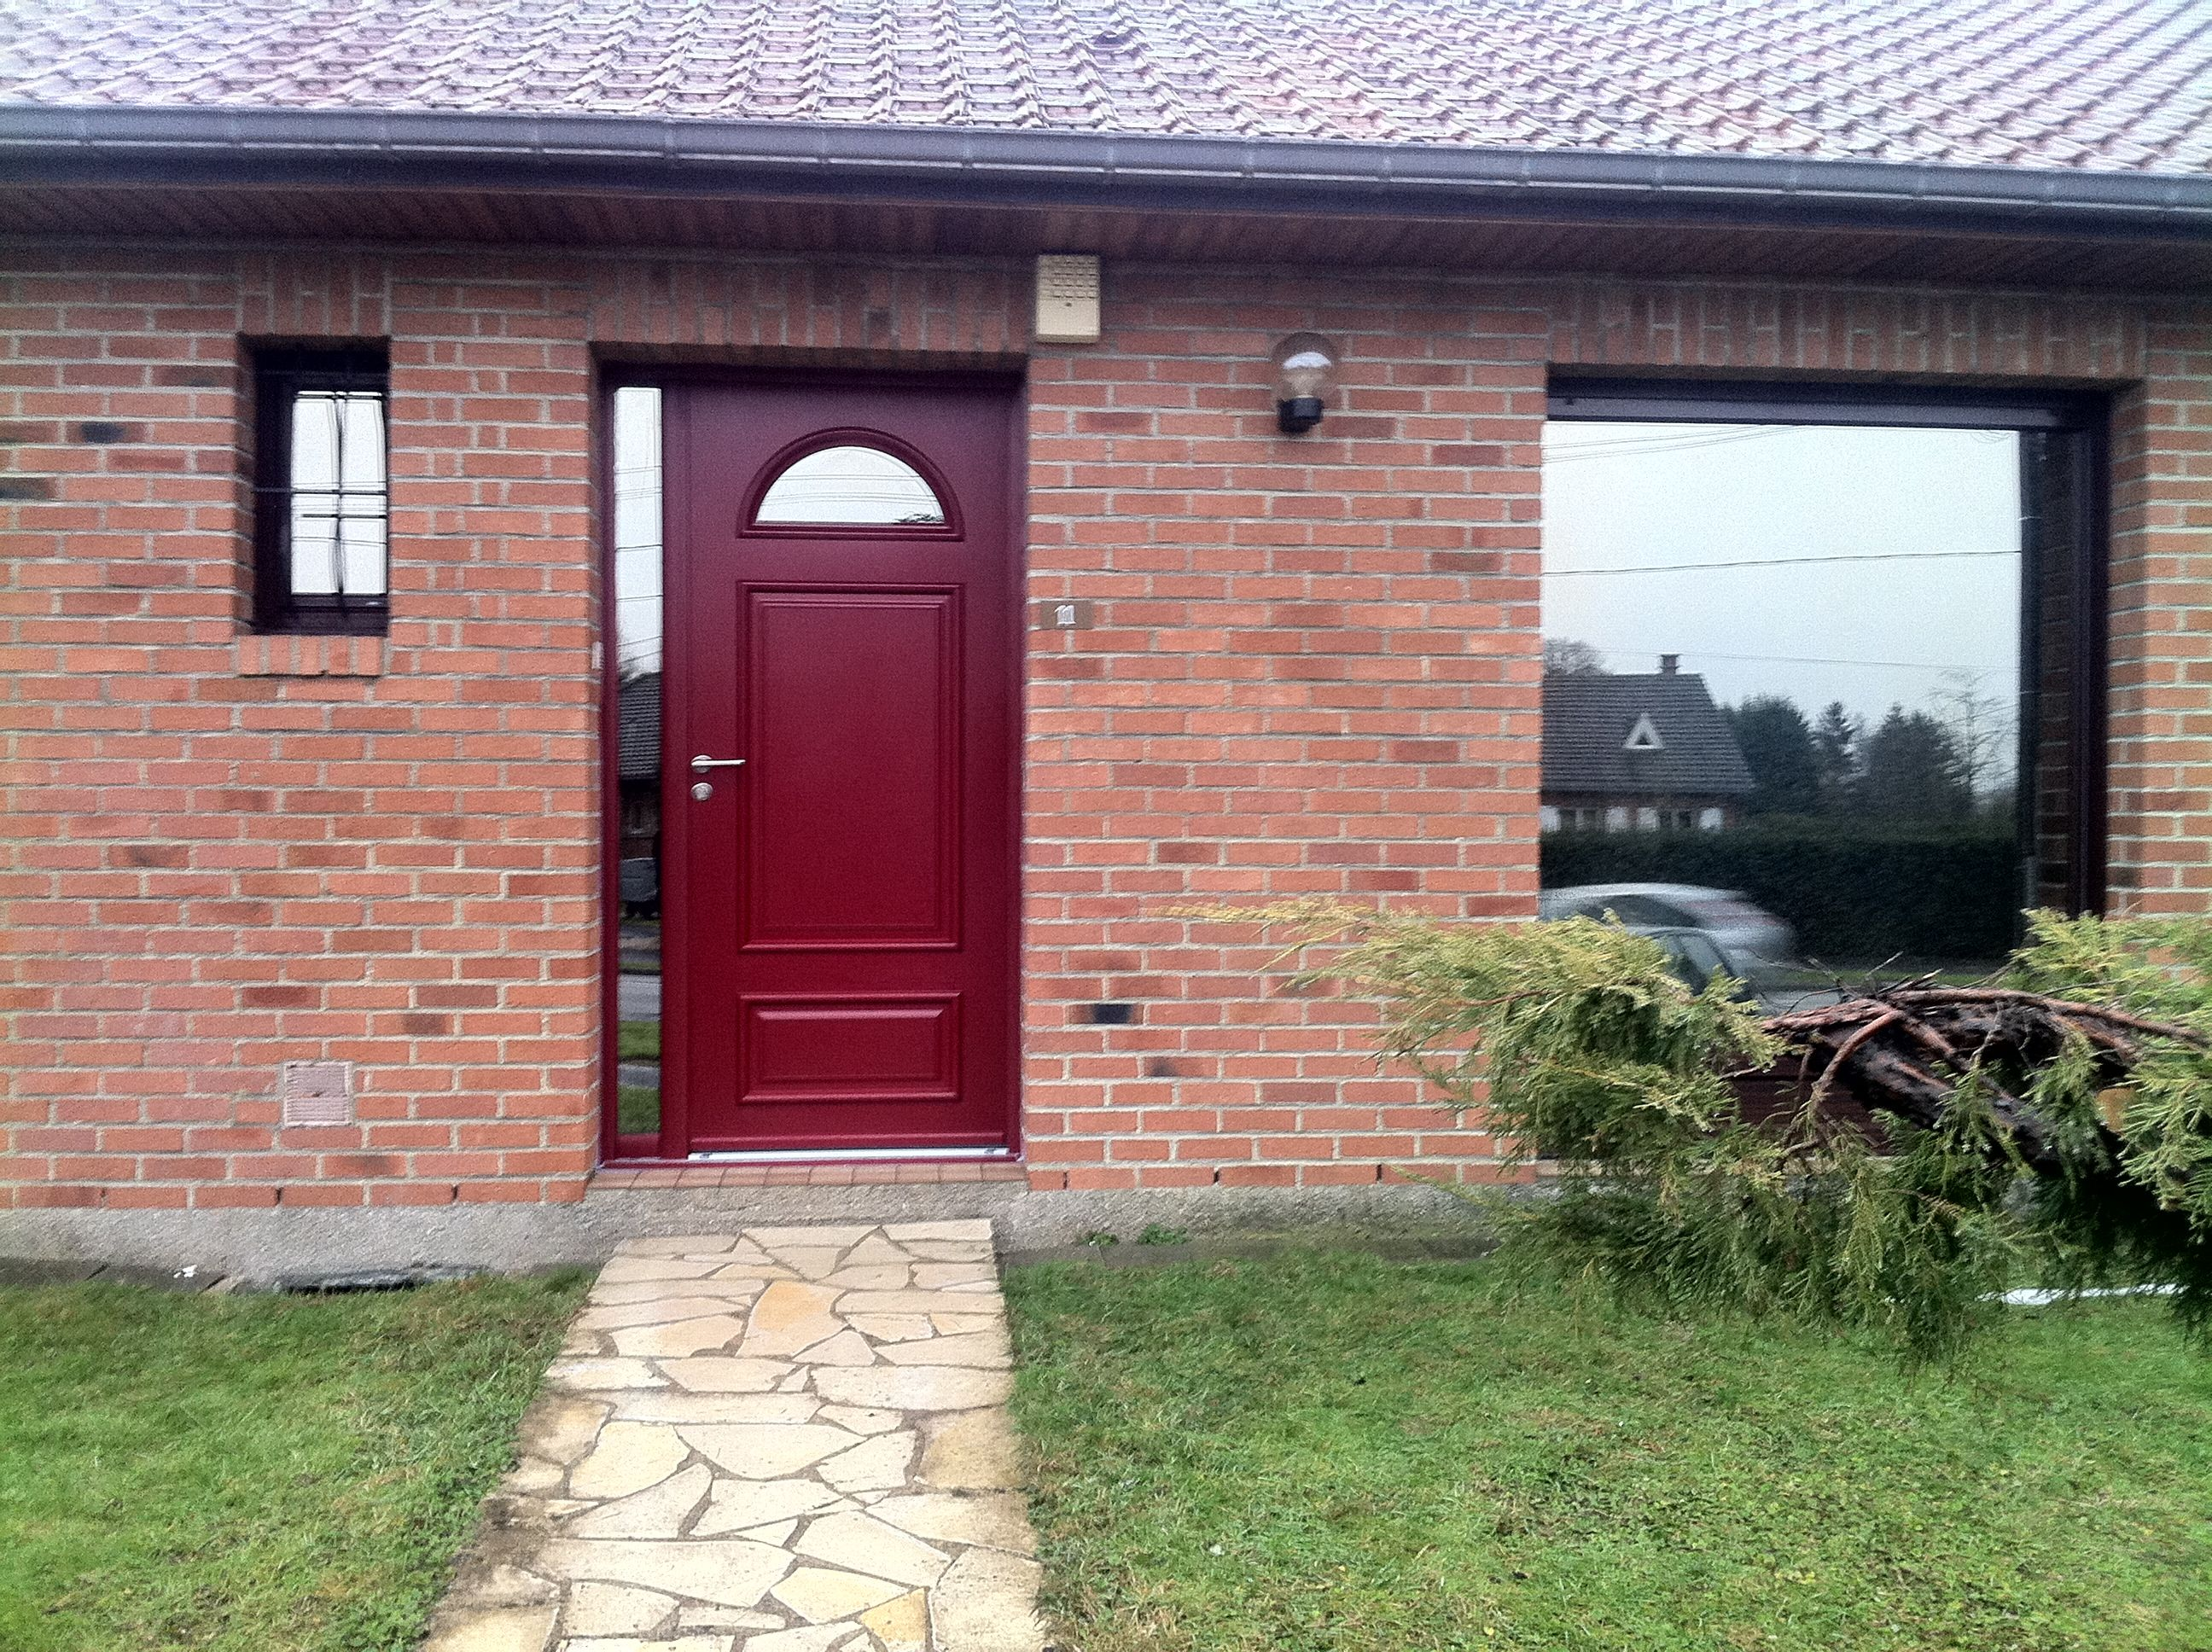 Porte D Entrée Rouge porte d'entrée rouge bordeaux en aluminium gamme minérale